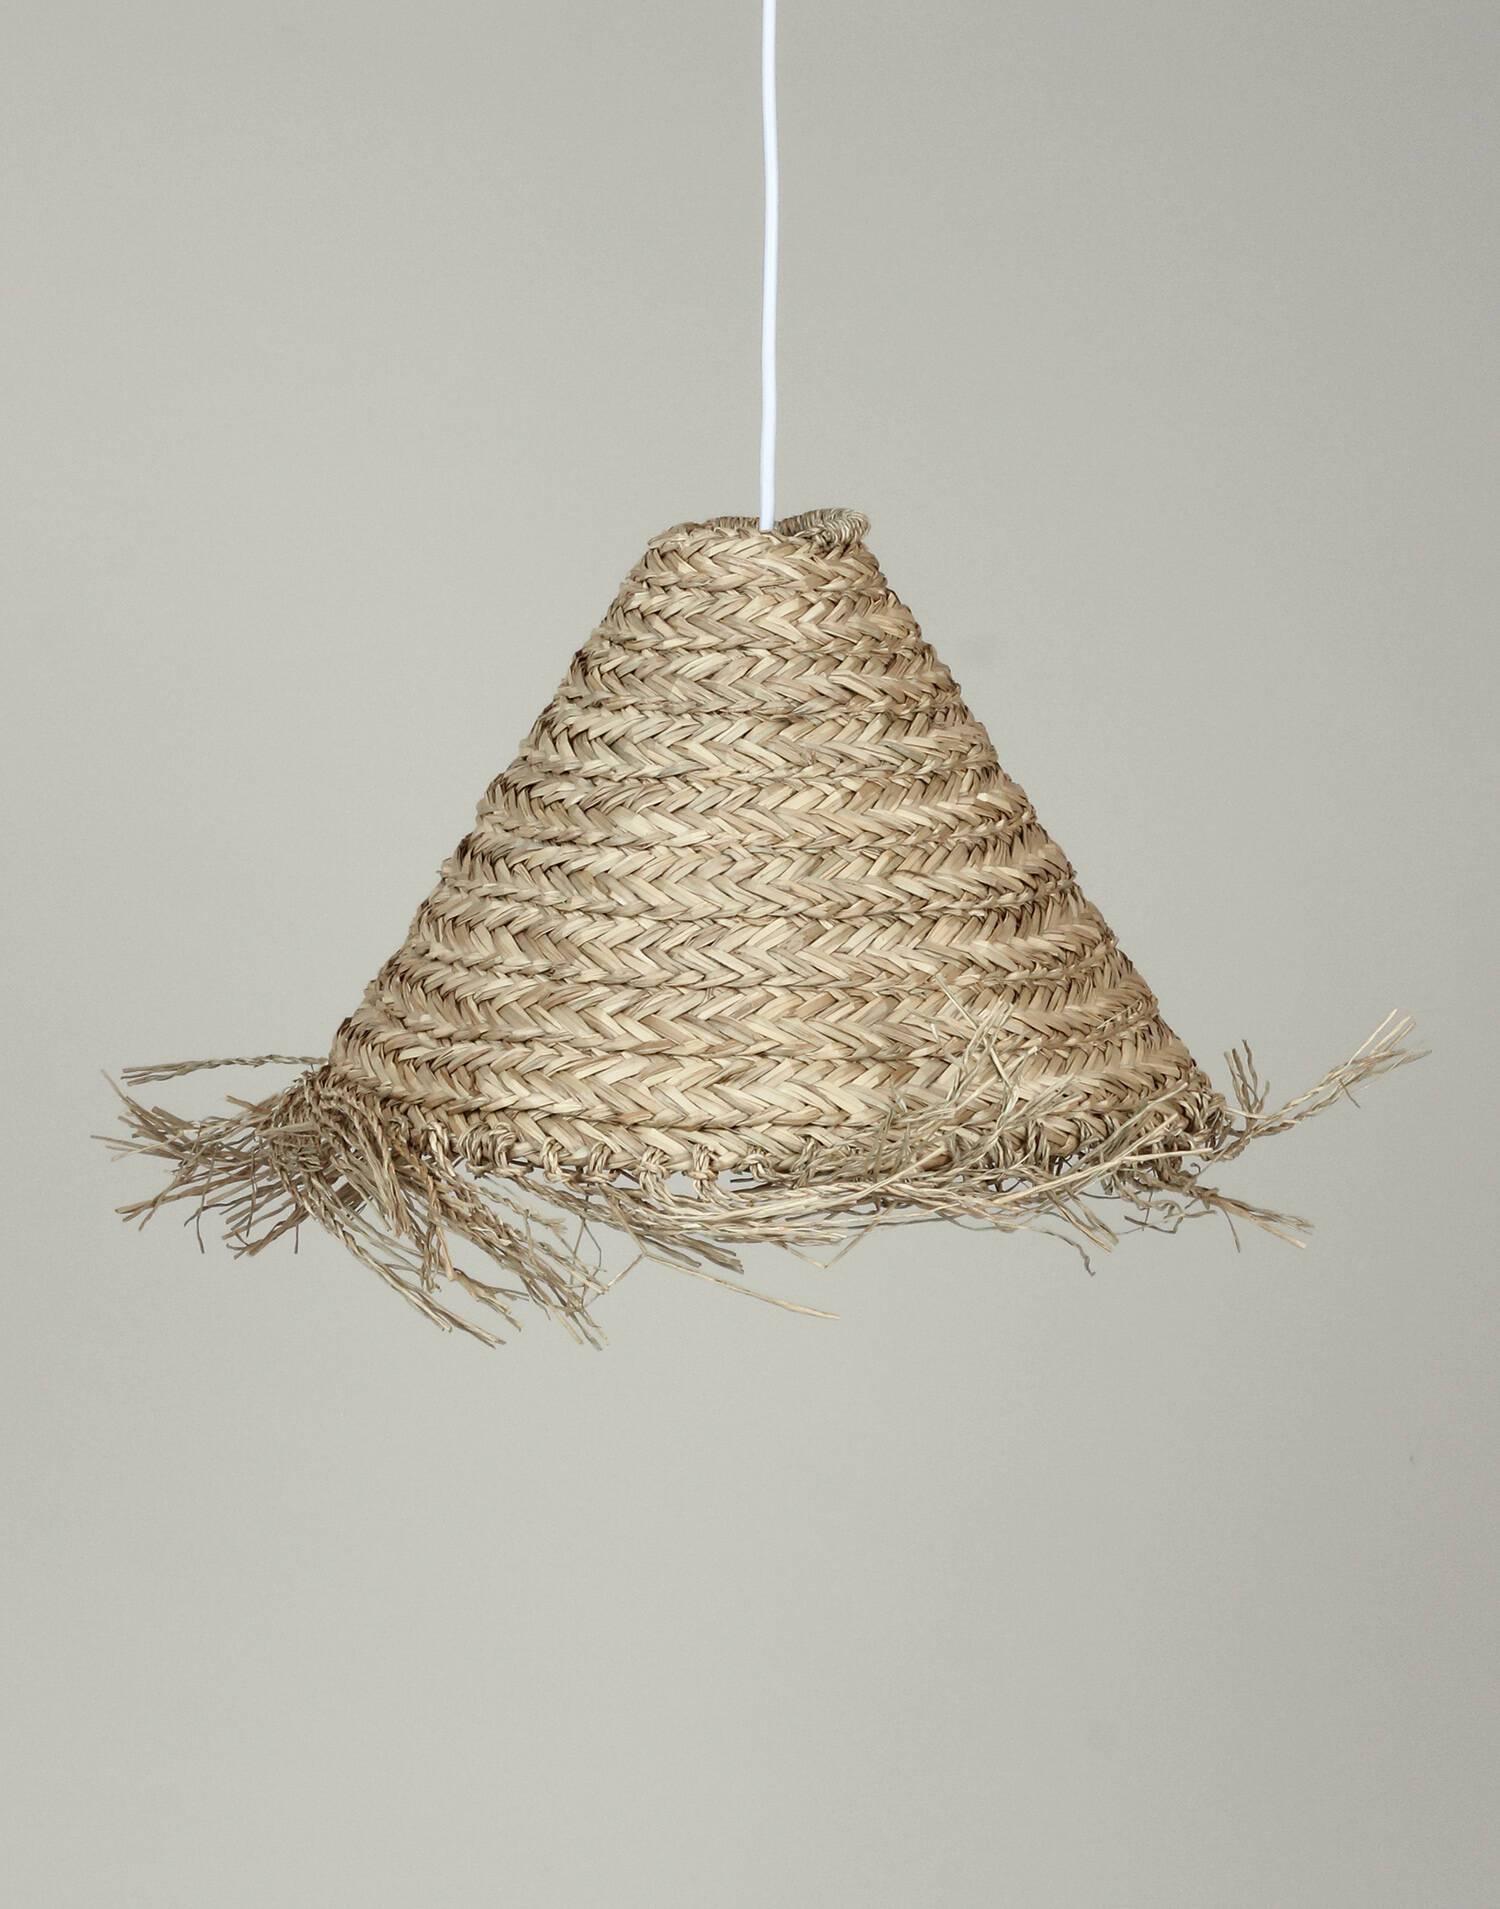 Cabrin-shaped straw light